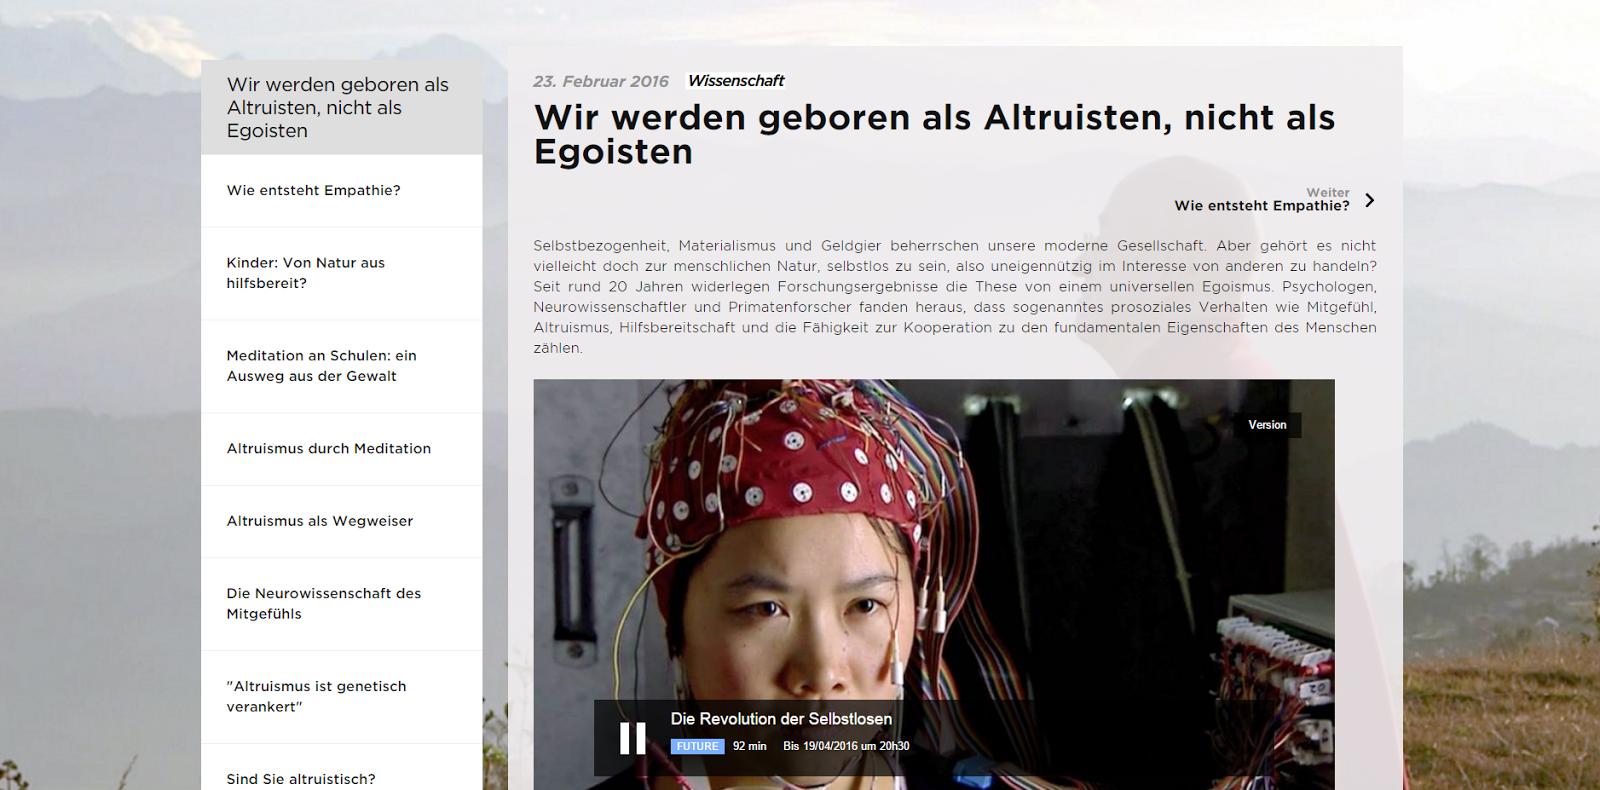 http://future.arte.tv/de/altruismus